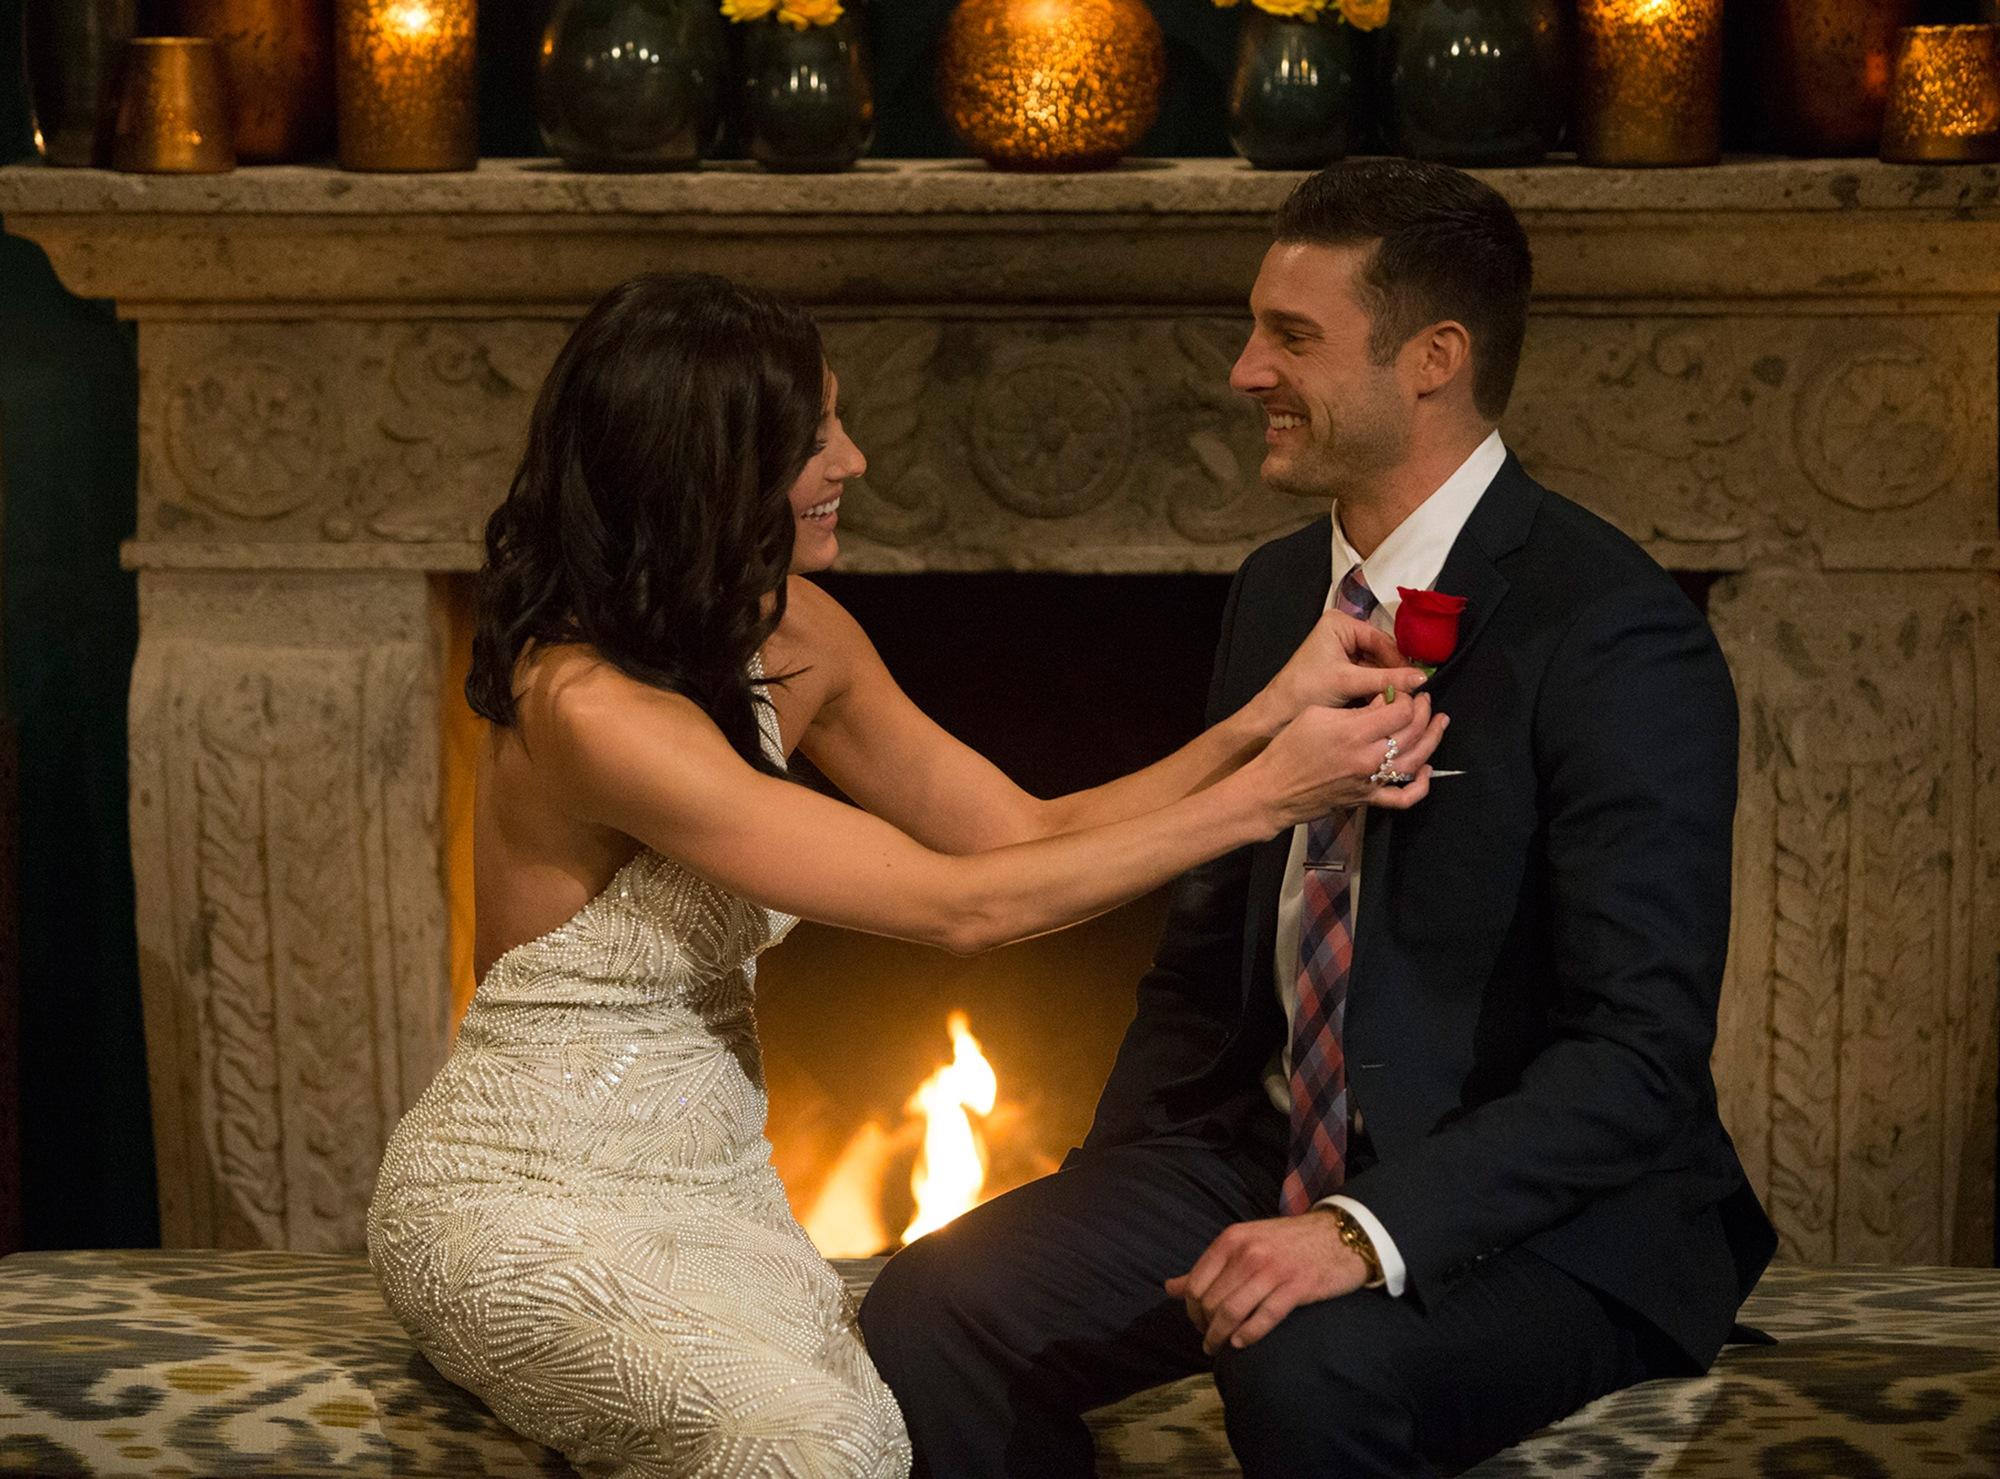 Becca Kufrin and Garrett Yrigoyen on The Bachelorette